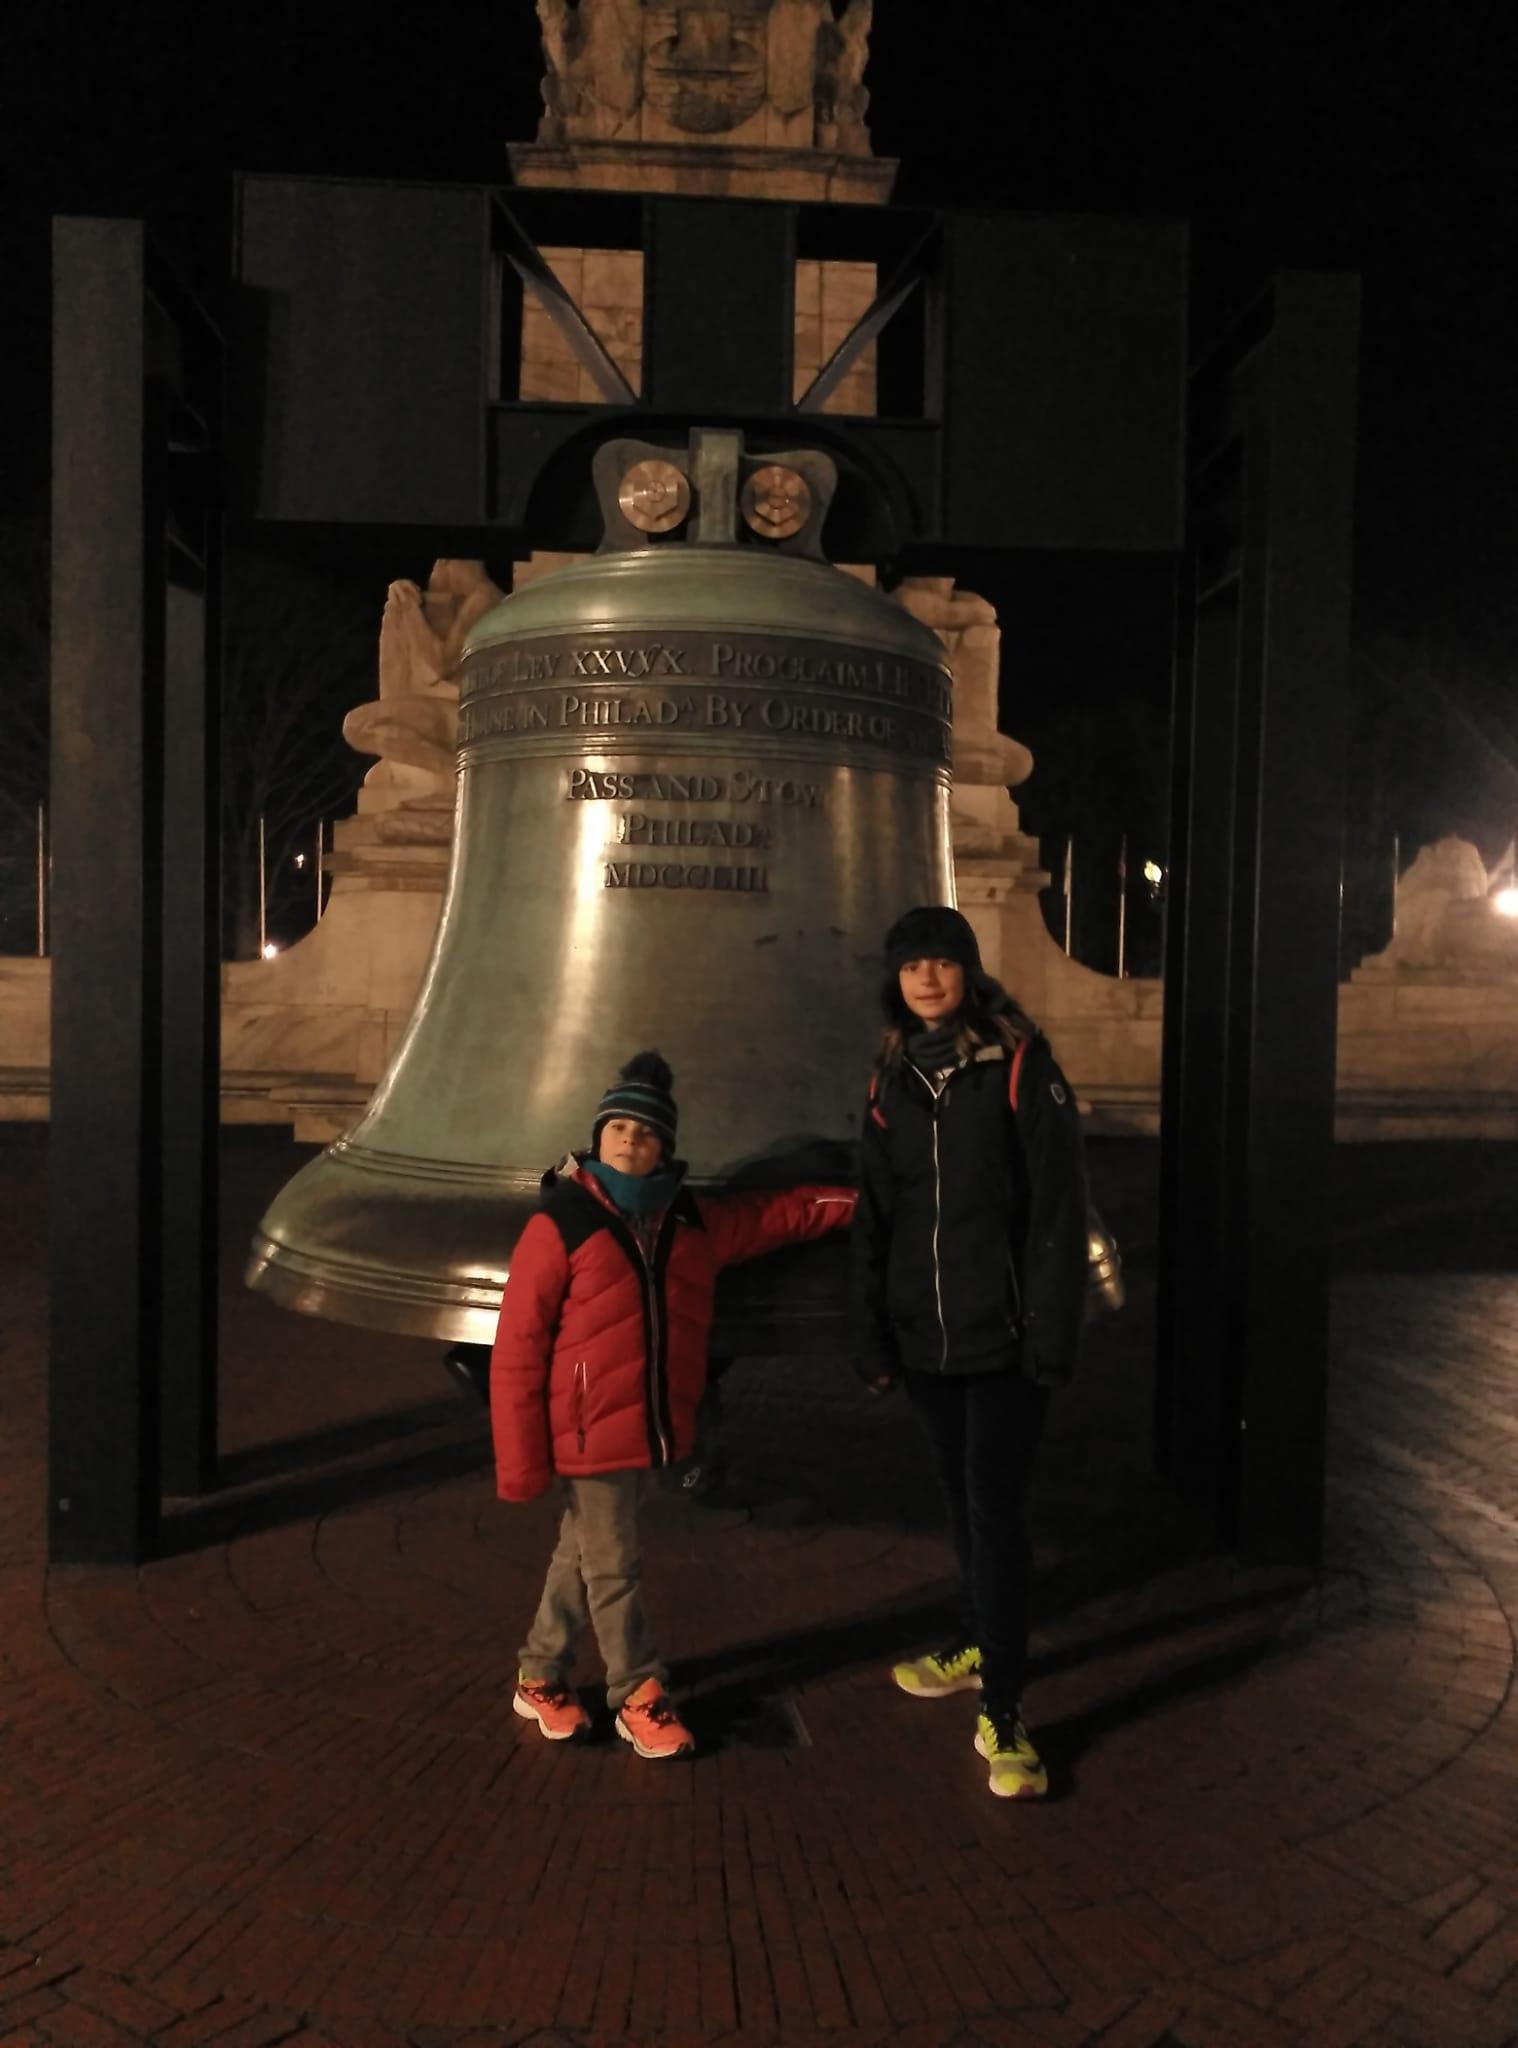 liberty bell - campana - libertad